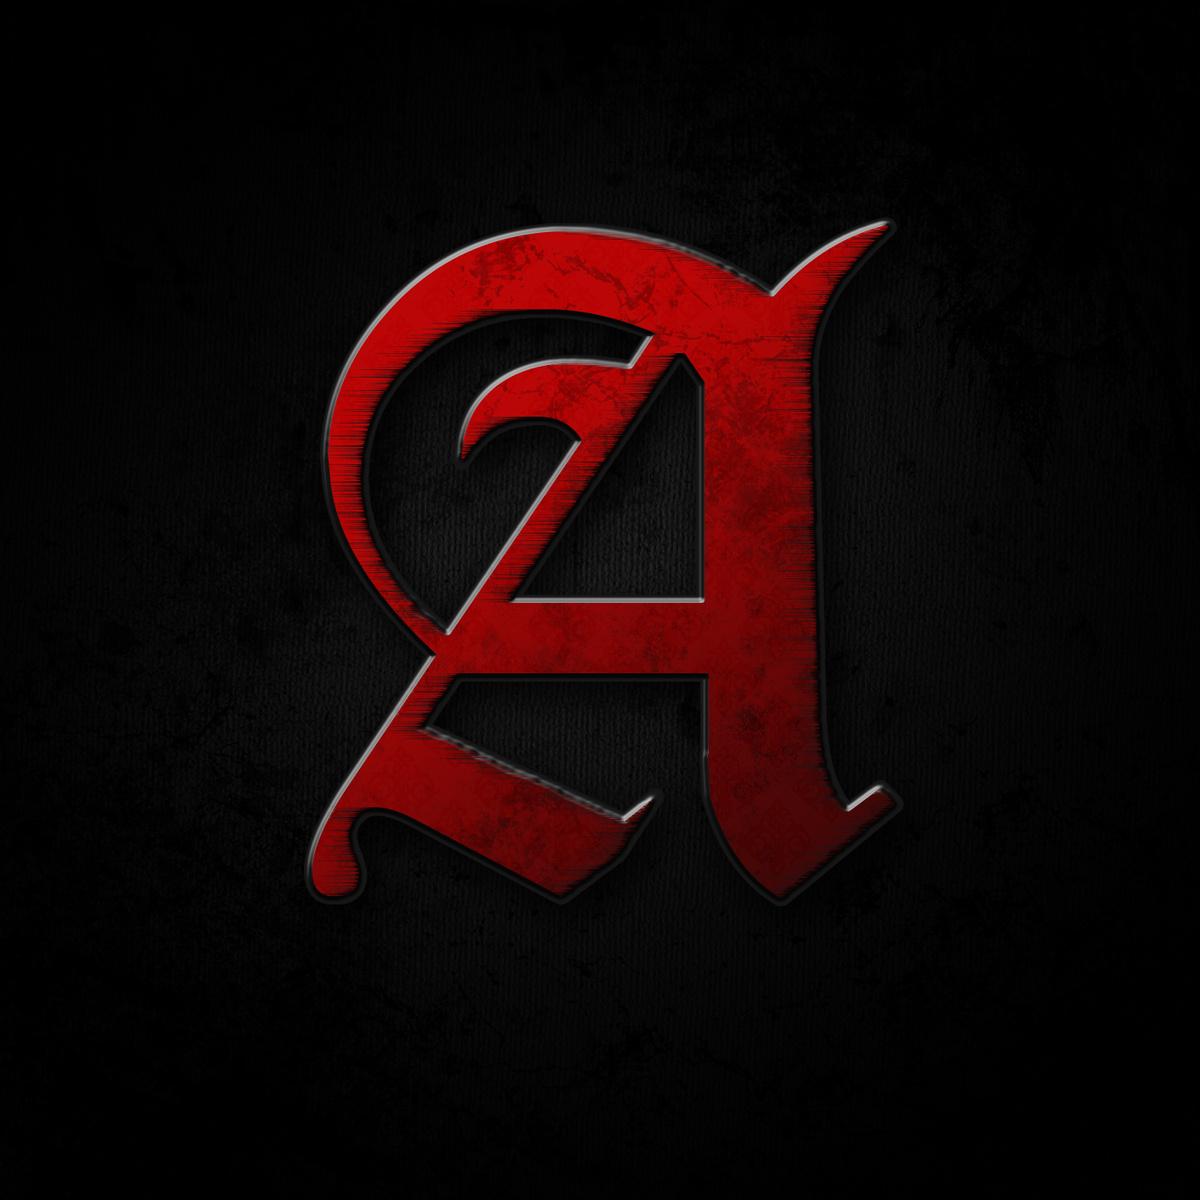 The Scarlet Letter Revisited